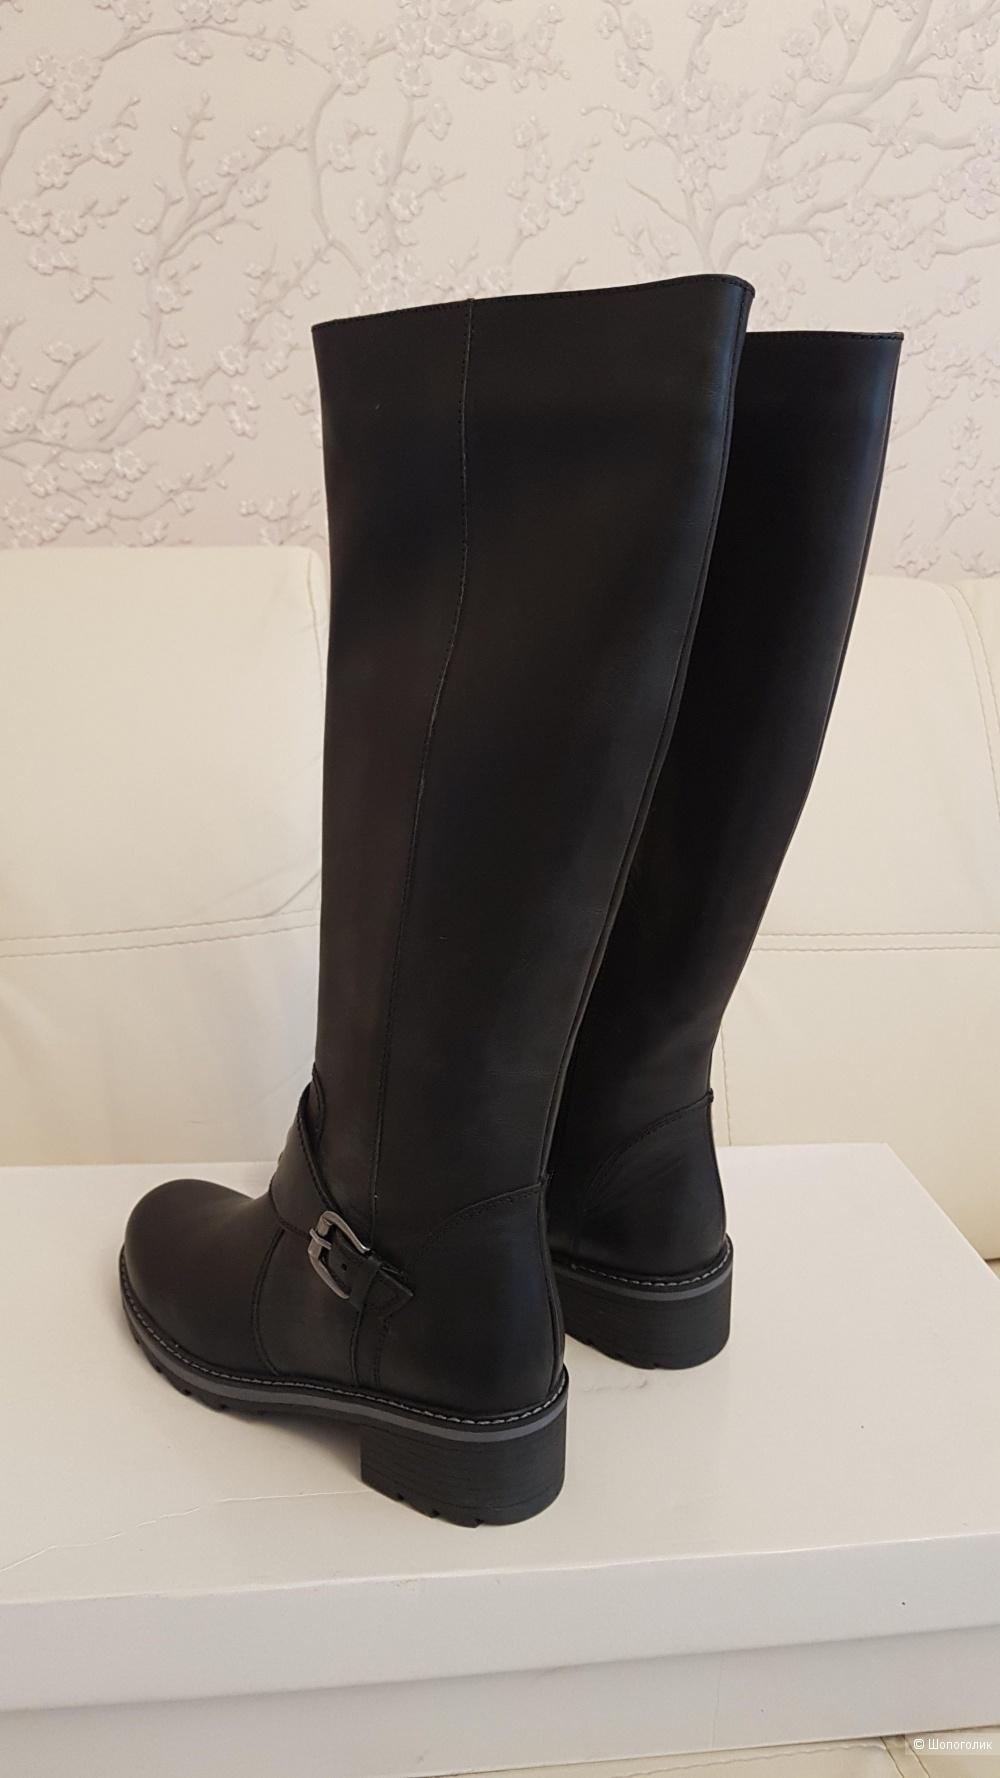 Сапоги Max moda, 36 размер